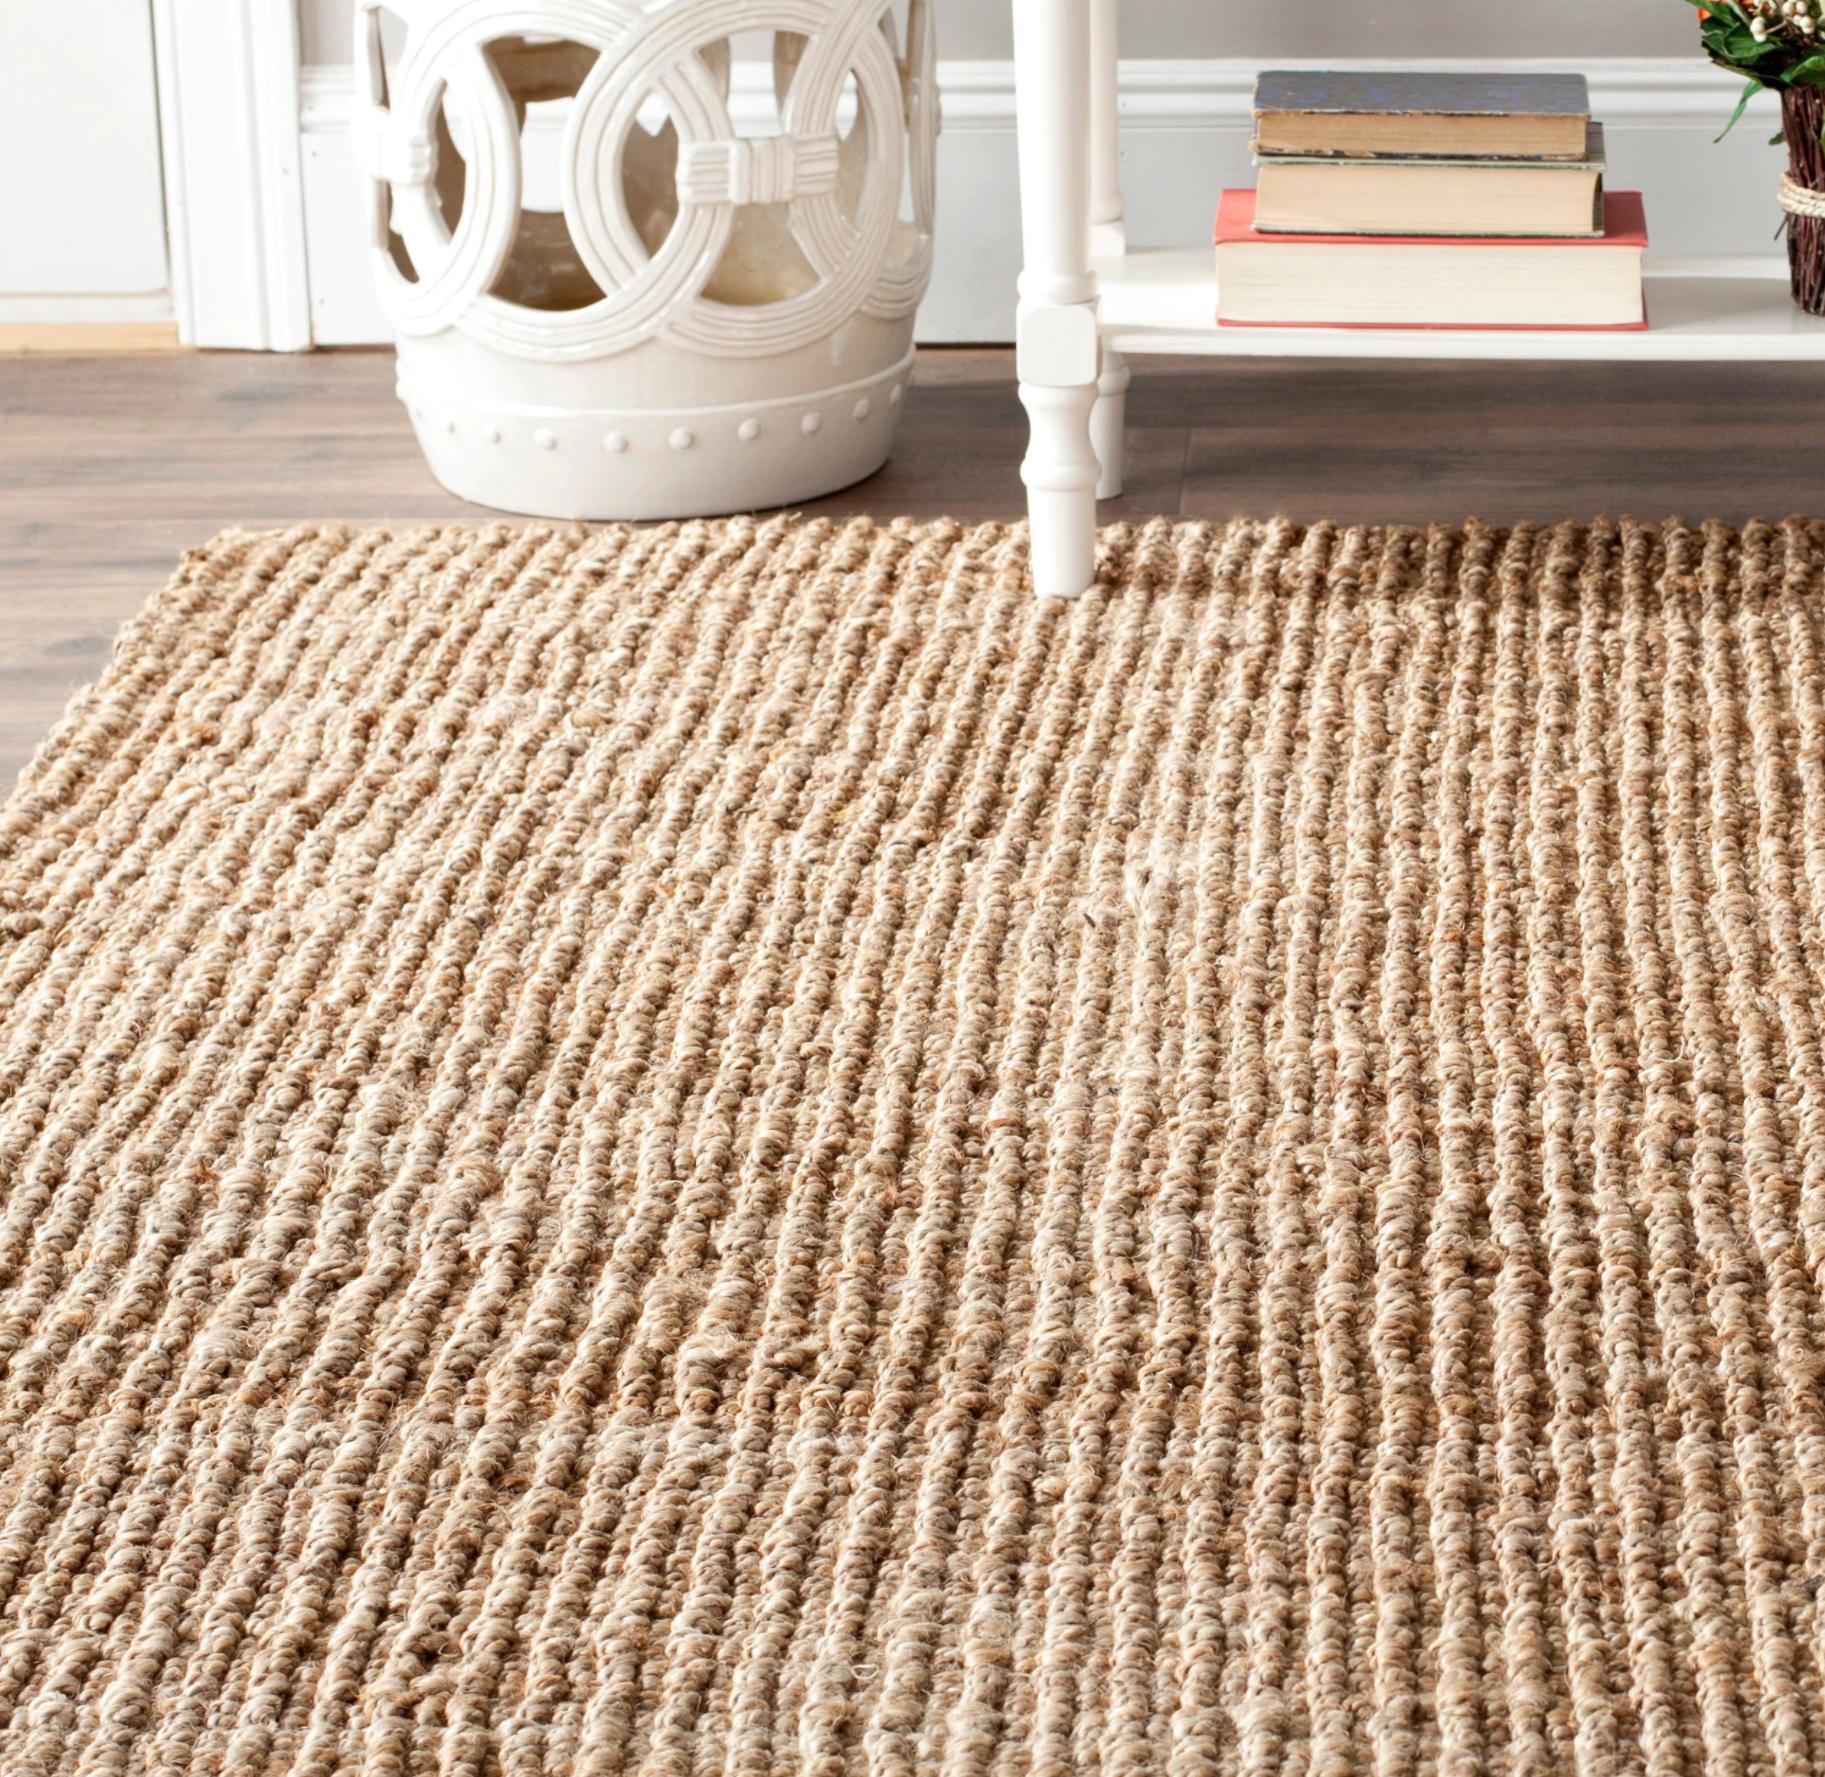 natural rugs safavieh natural jute hand-woven chunky rug BGVPFPQ